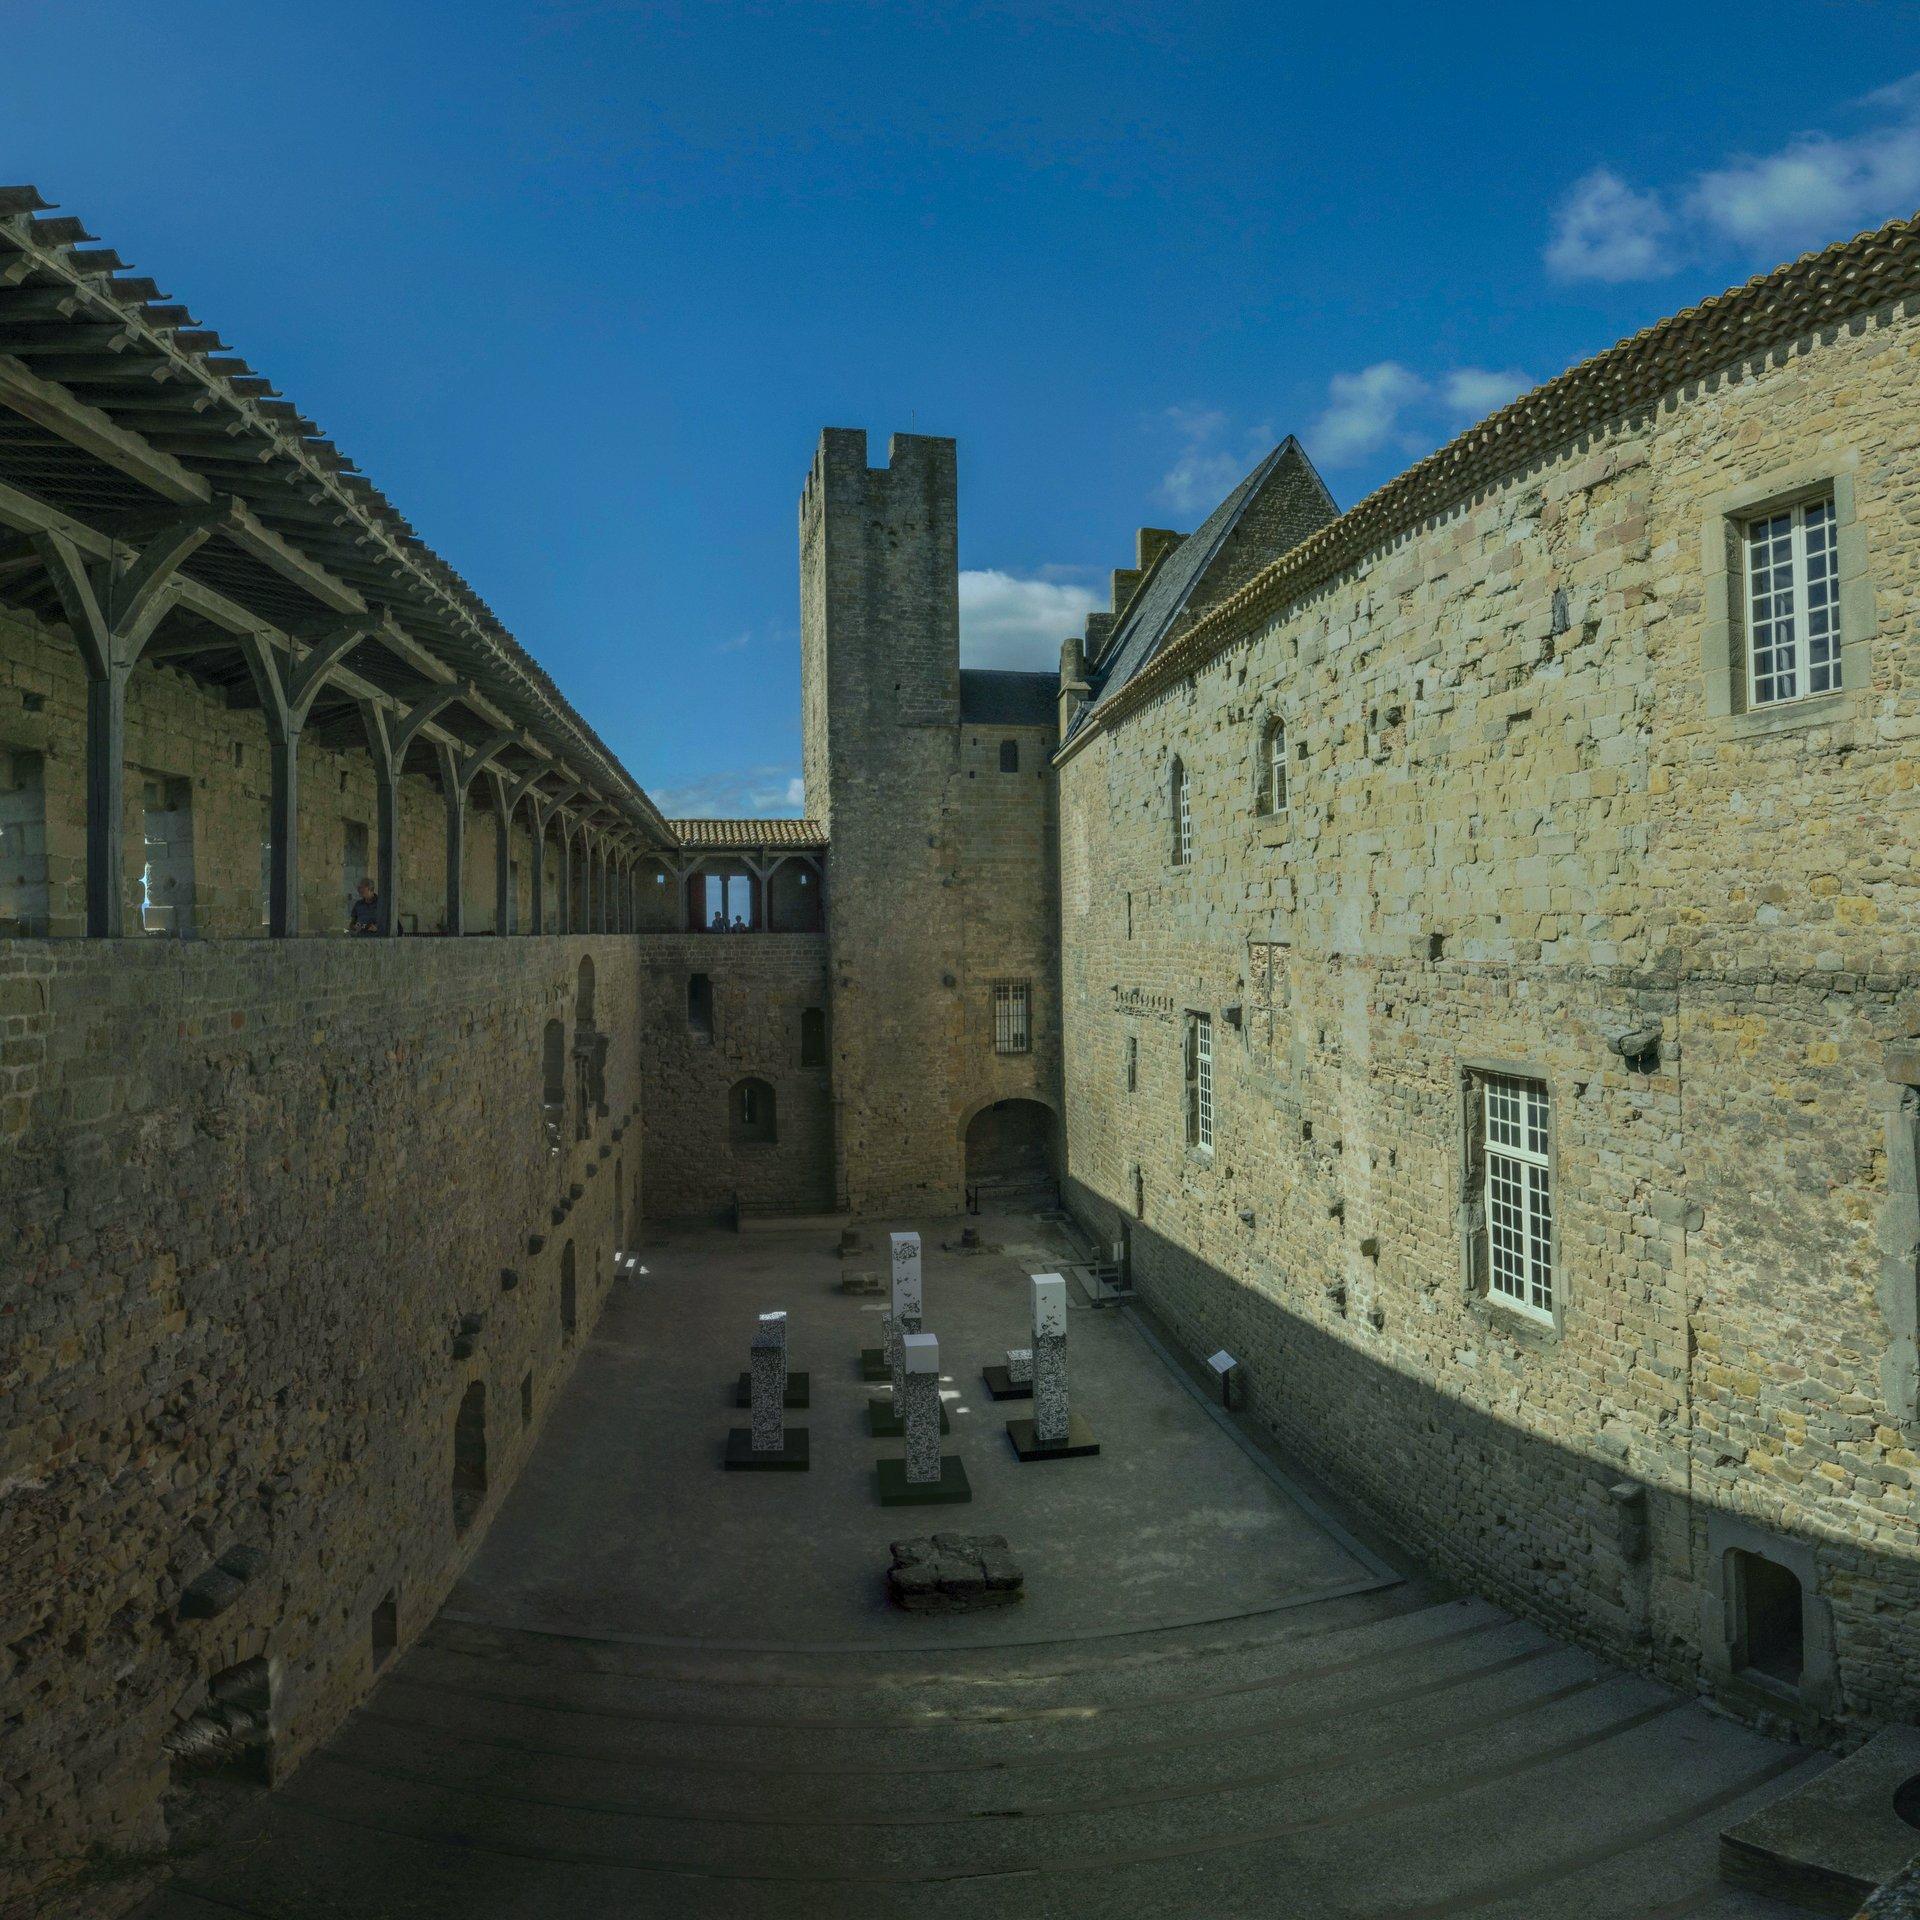 Kleinerer Innenhof des Château Comtal in der Cité Carcassonne